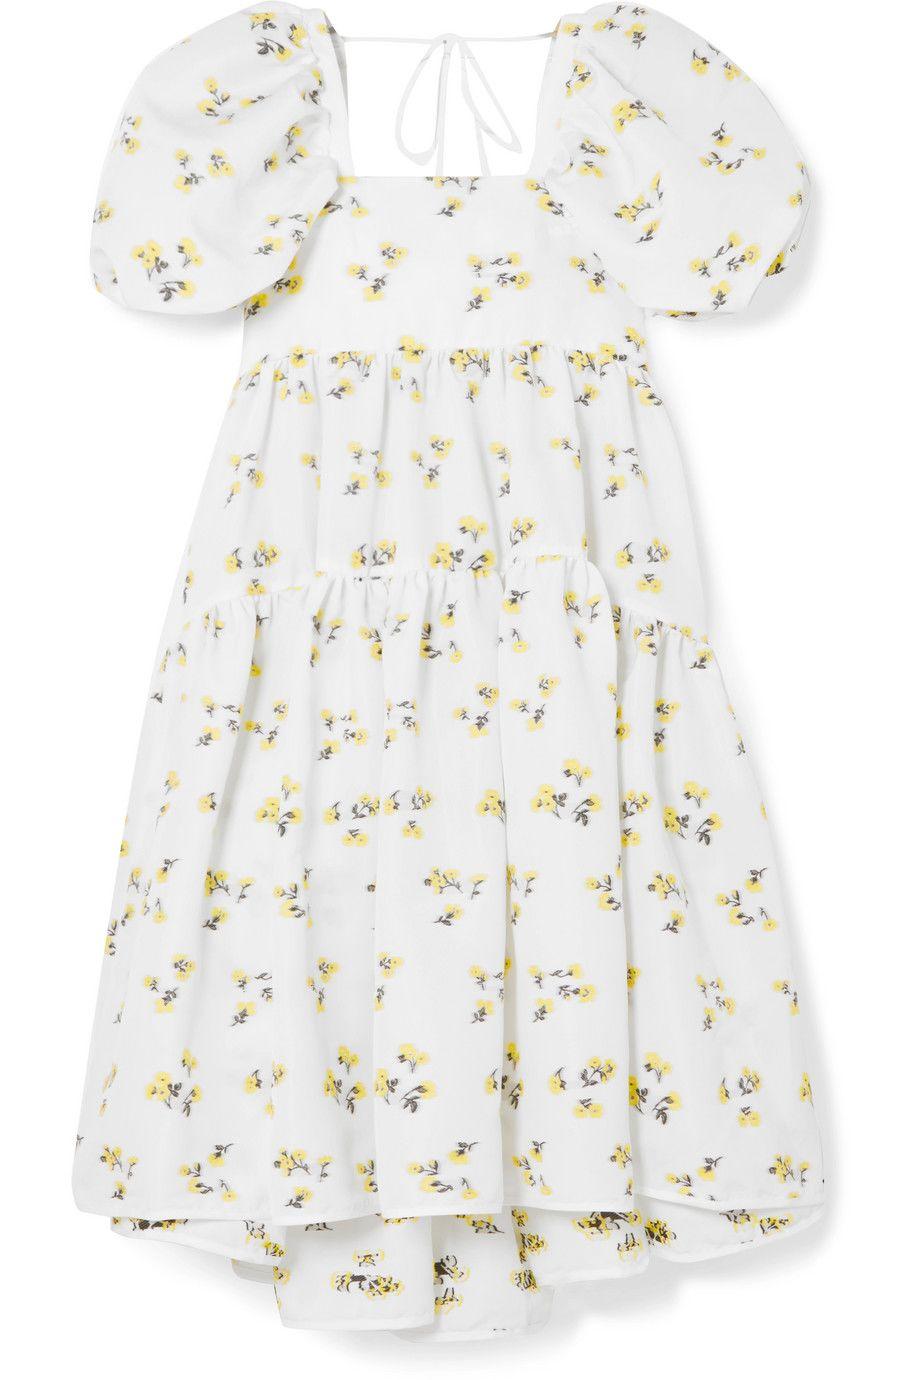 FLORAL PRINT WHITE MINI DRESS